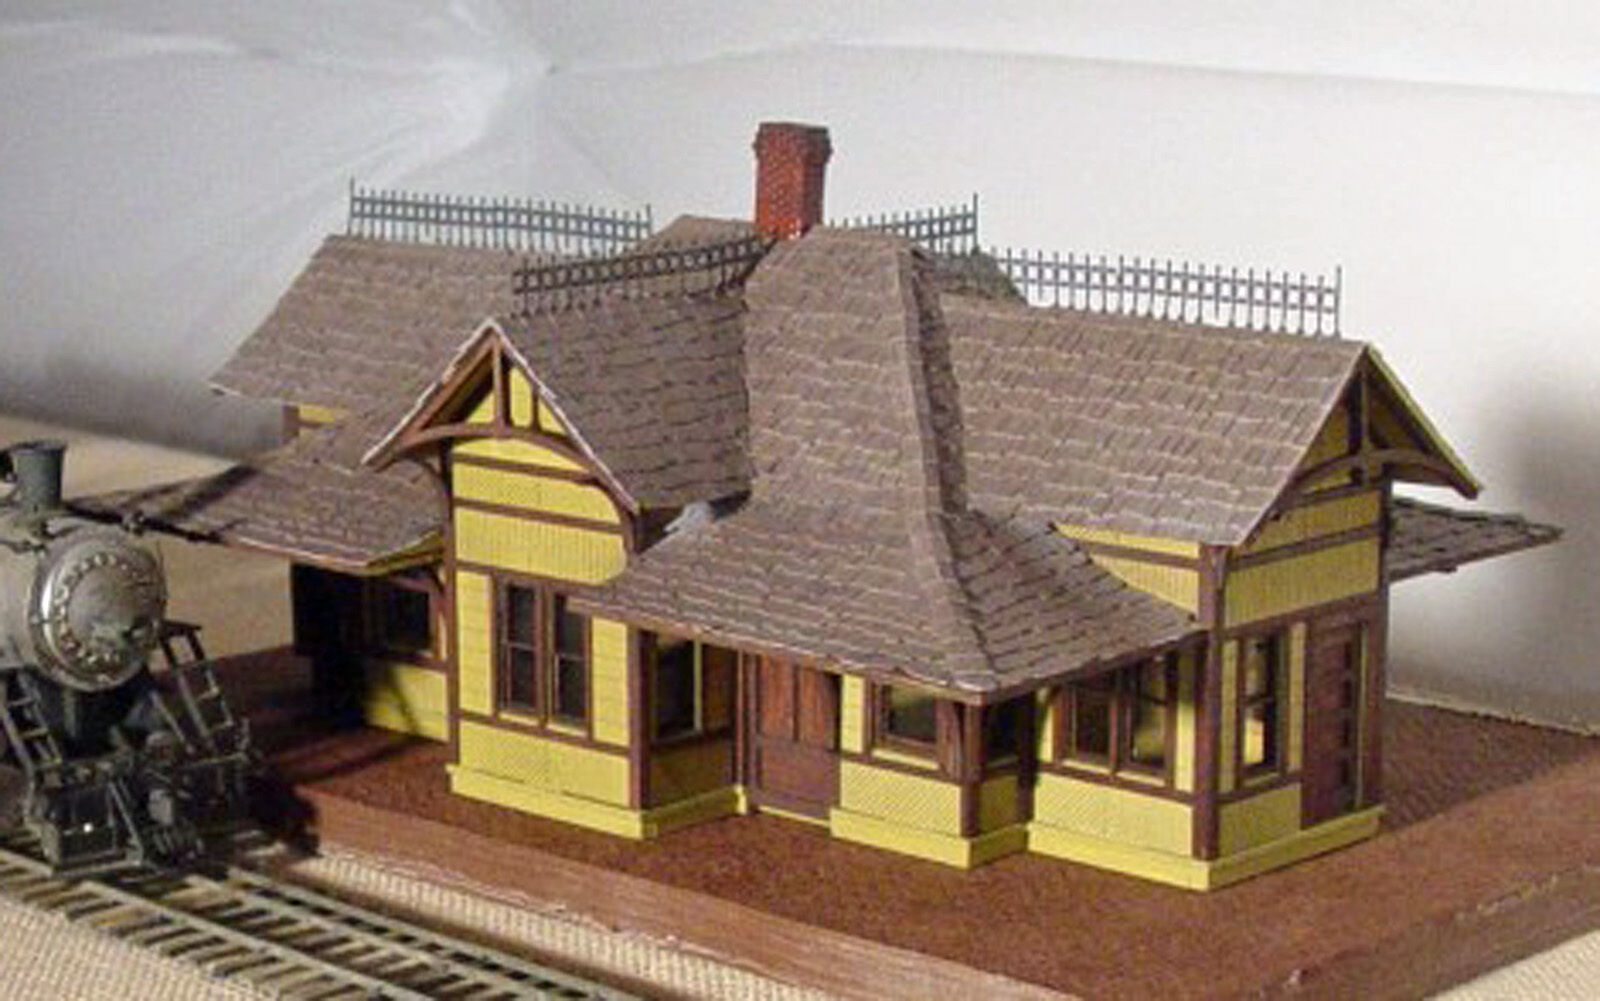 Tomahawk estación s Sn3 modelo del ferrocarril estructura de madera sin pintar KIT de láser gmtss